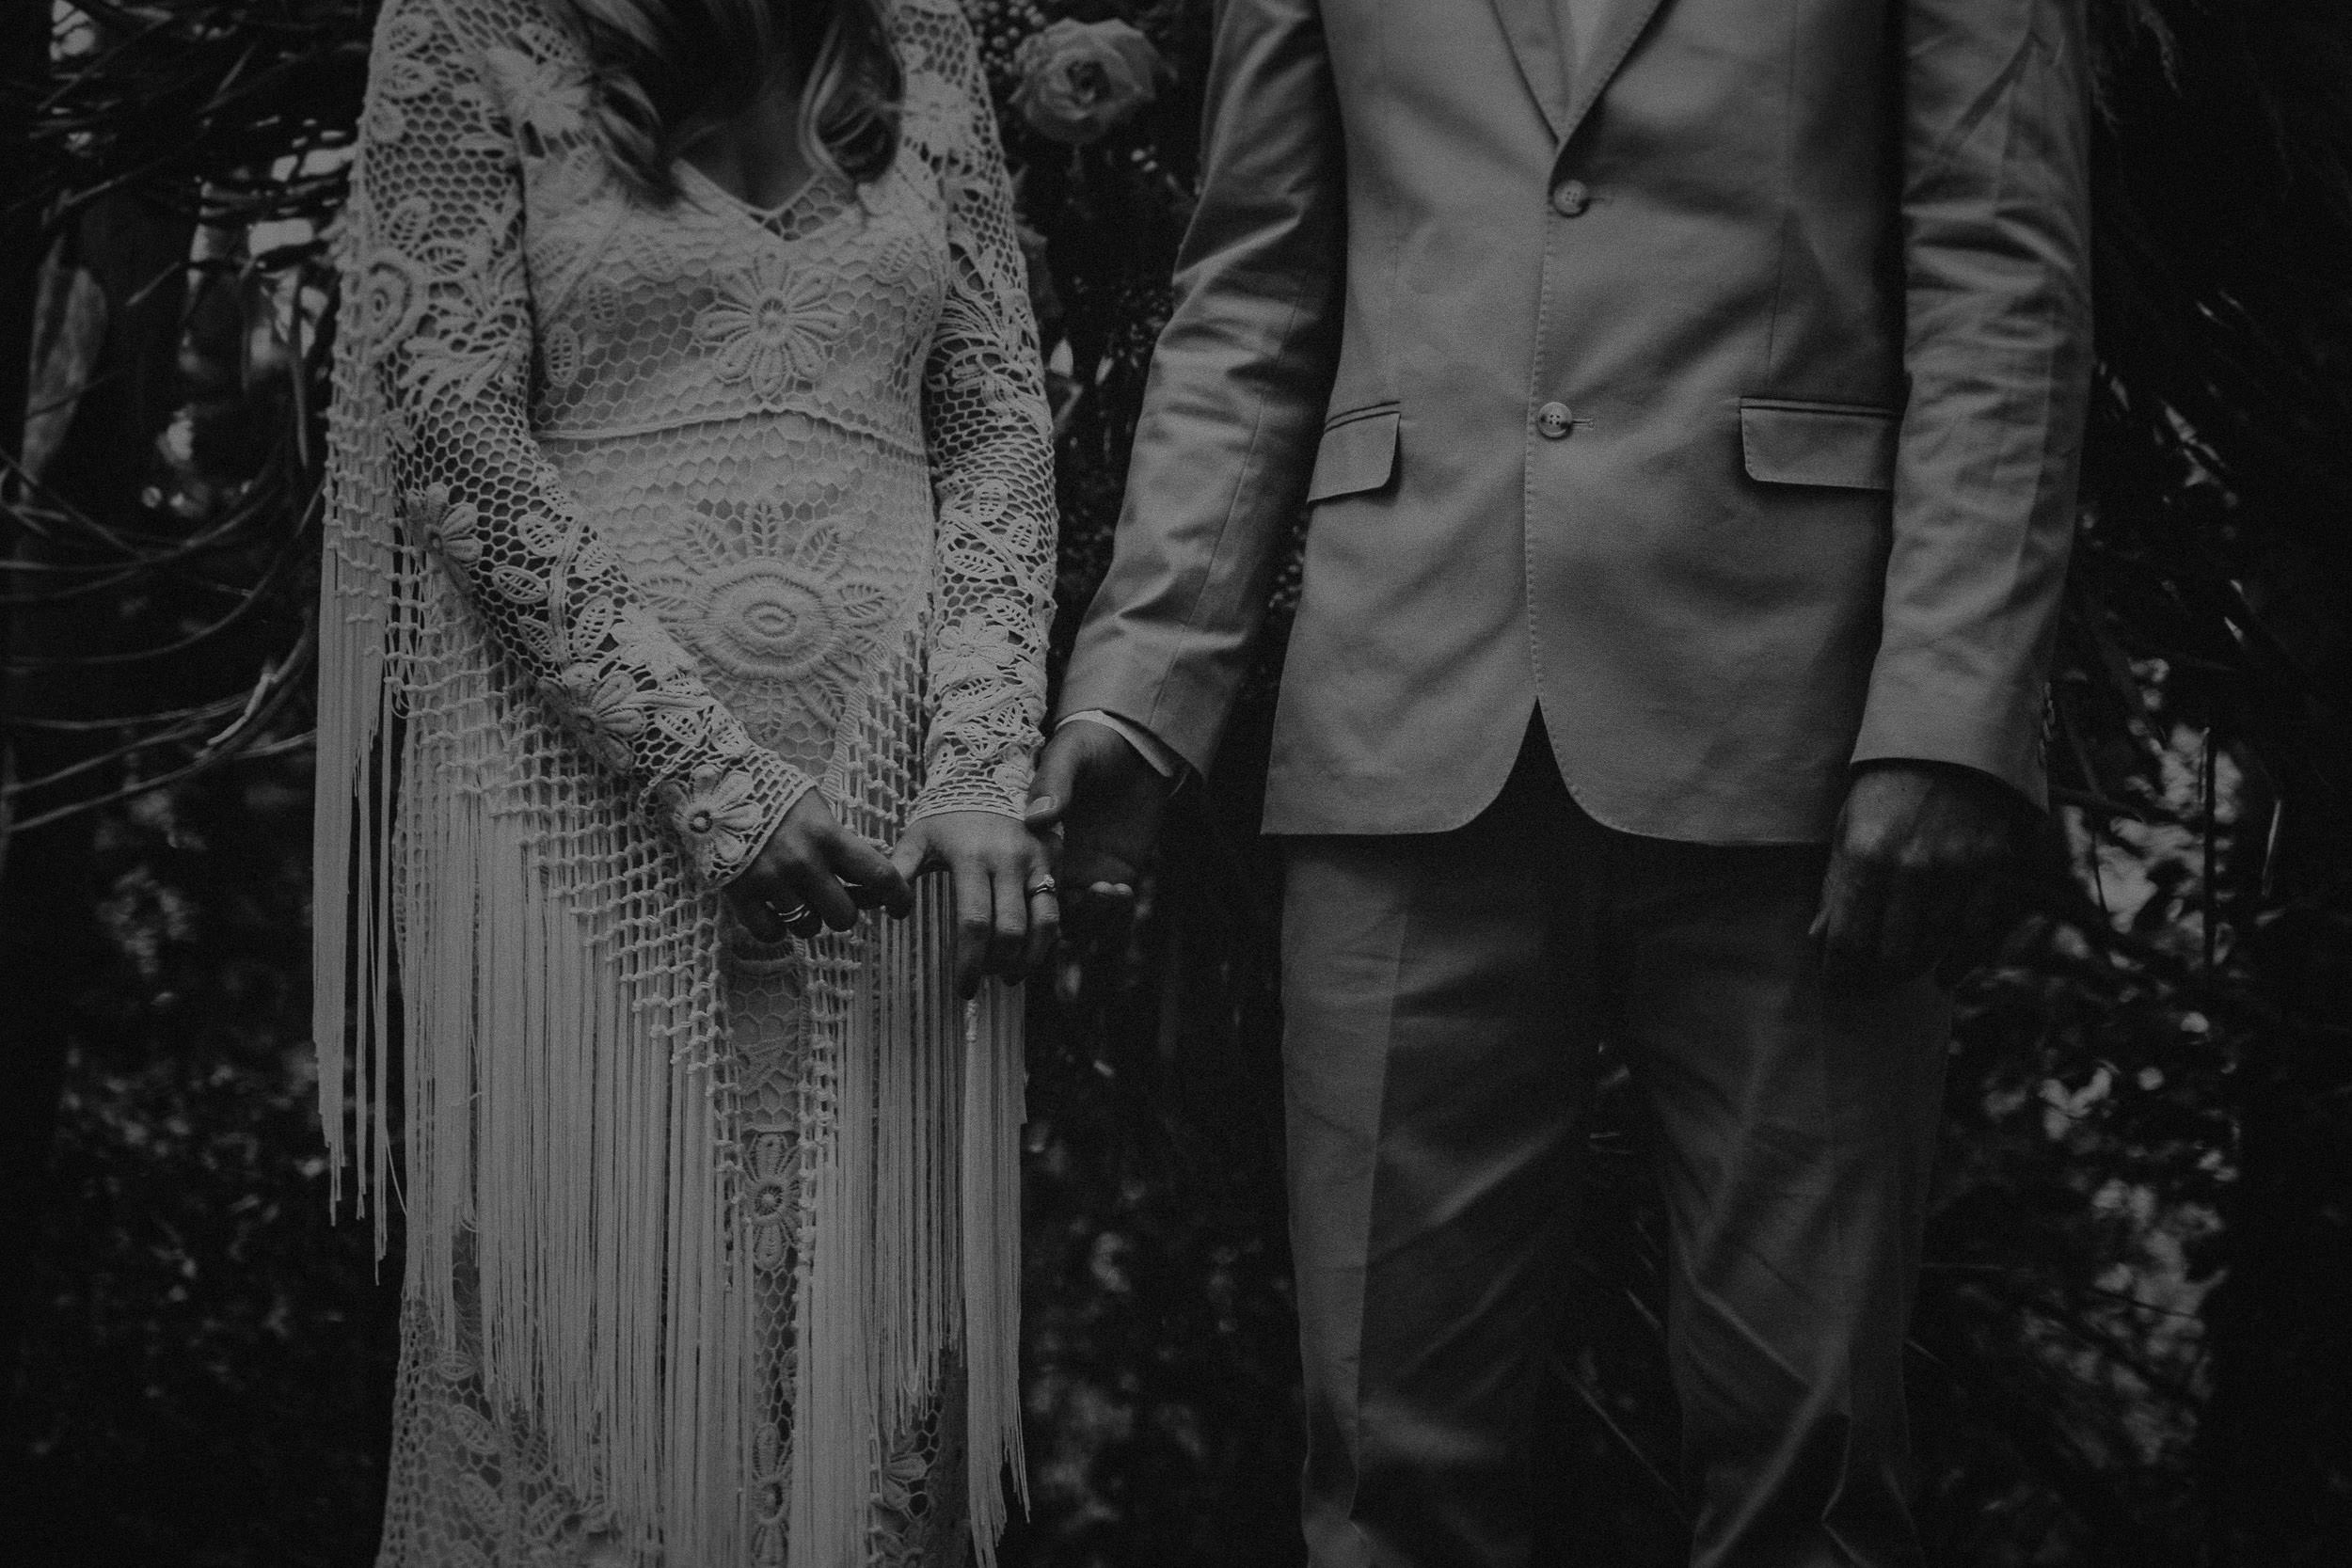 S&A Elopement - Kings & Thieves - Shred 'Til Dead - Central Coast Beach Forest Wedding - 233.jpg